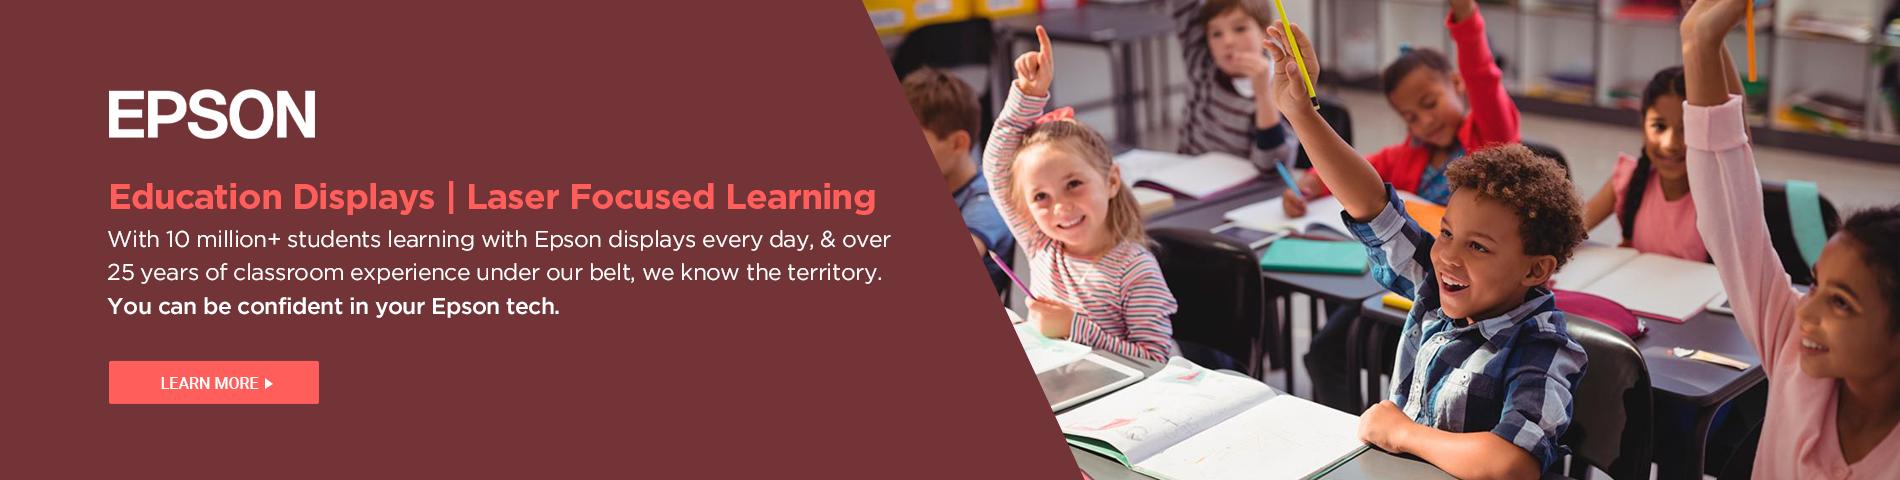 Epson Education Displays | Laser-Focused Learning